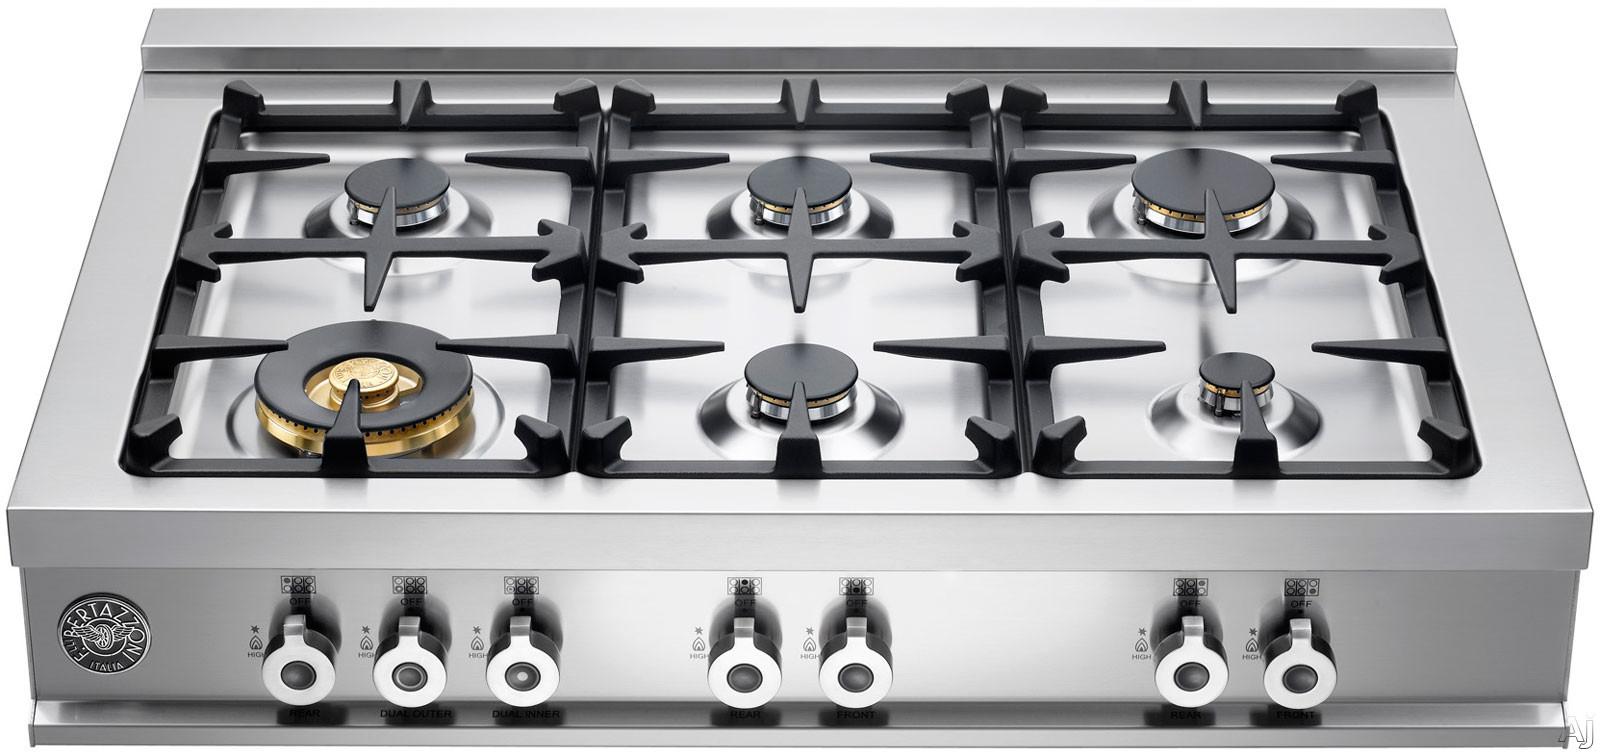 "Bertazzoni Professional Series CB36600X 36"" Pro-Style Gas Rangetop with 6 Sealed Burners, 18,000 BTU, U.S. & Canada CB36600X"